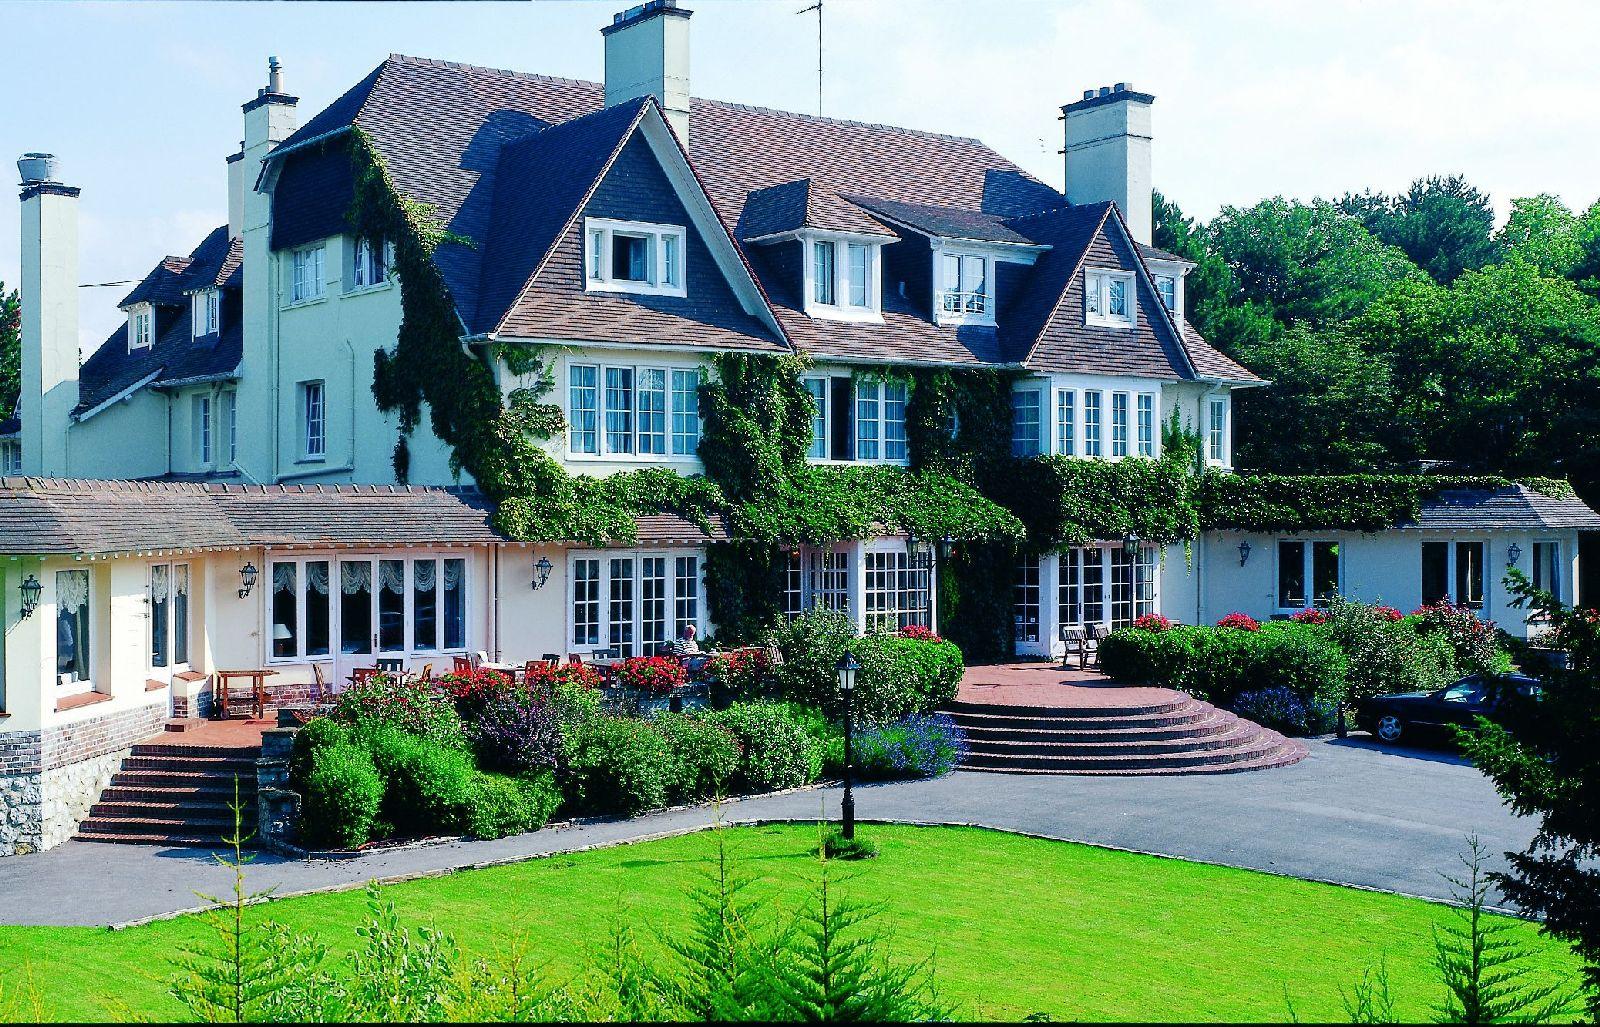 golf-expedition-golf-reizen-frankrijk-regio-pas-de-calais-le-manoir-hotel-luxe-hotel-voorkant.jpg